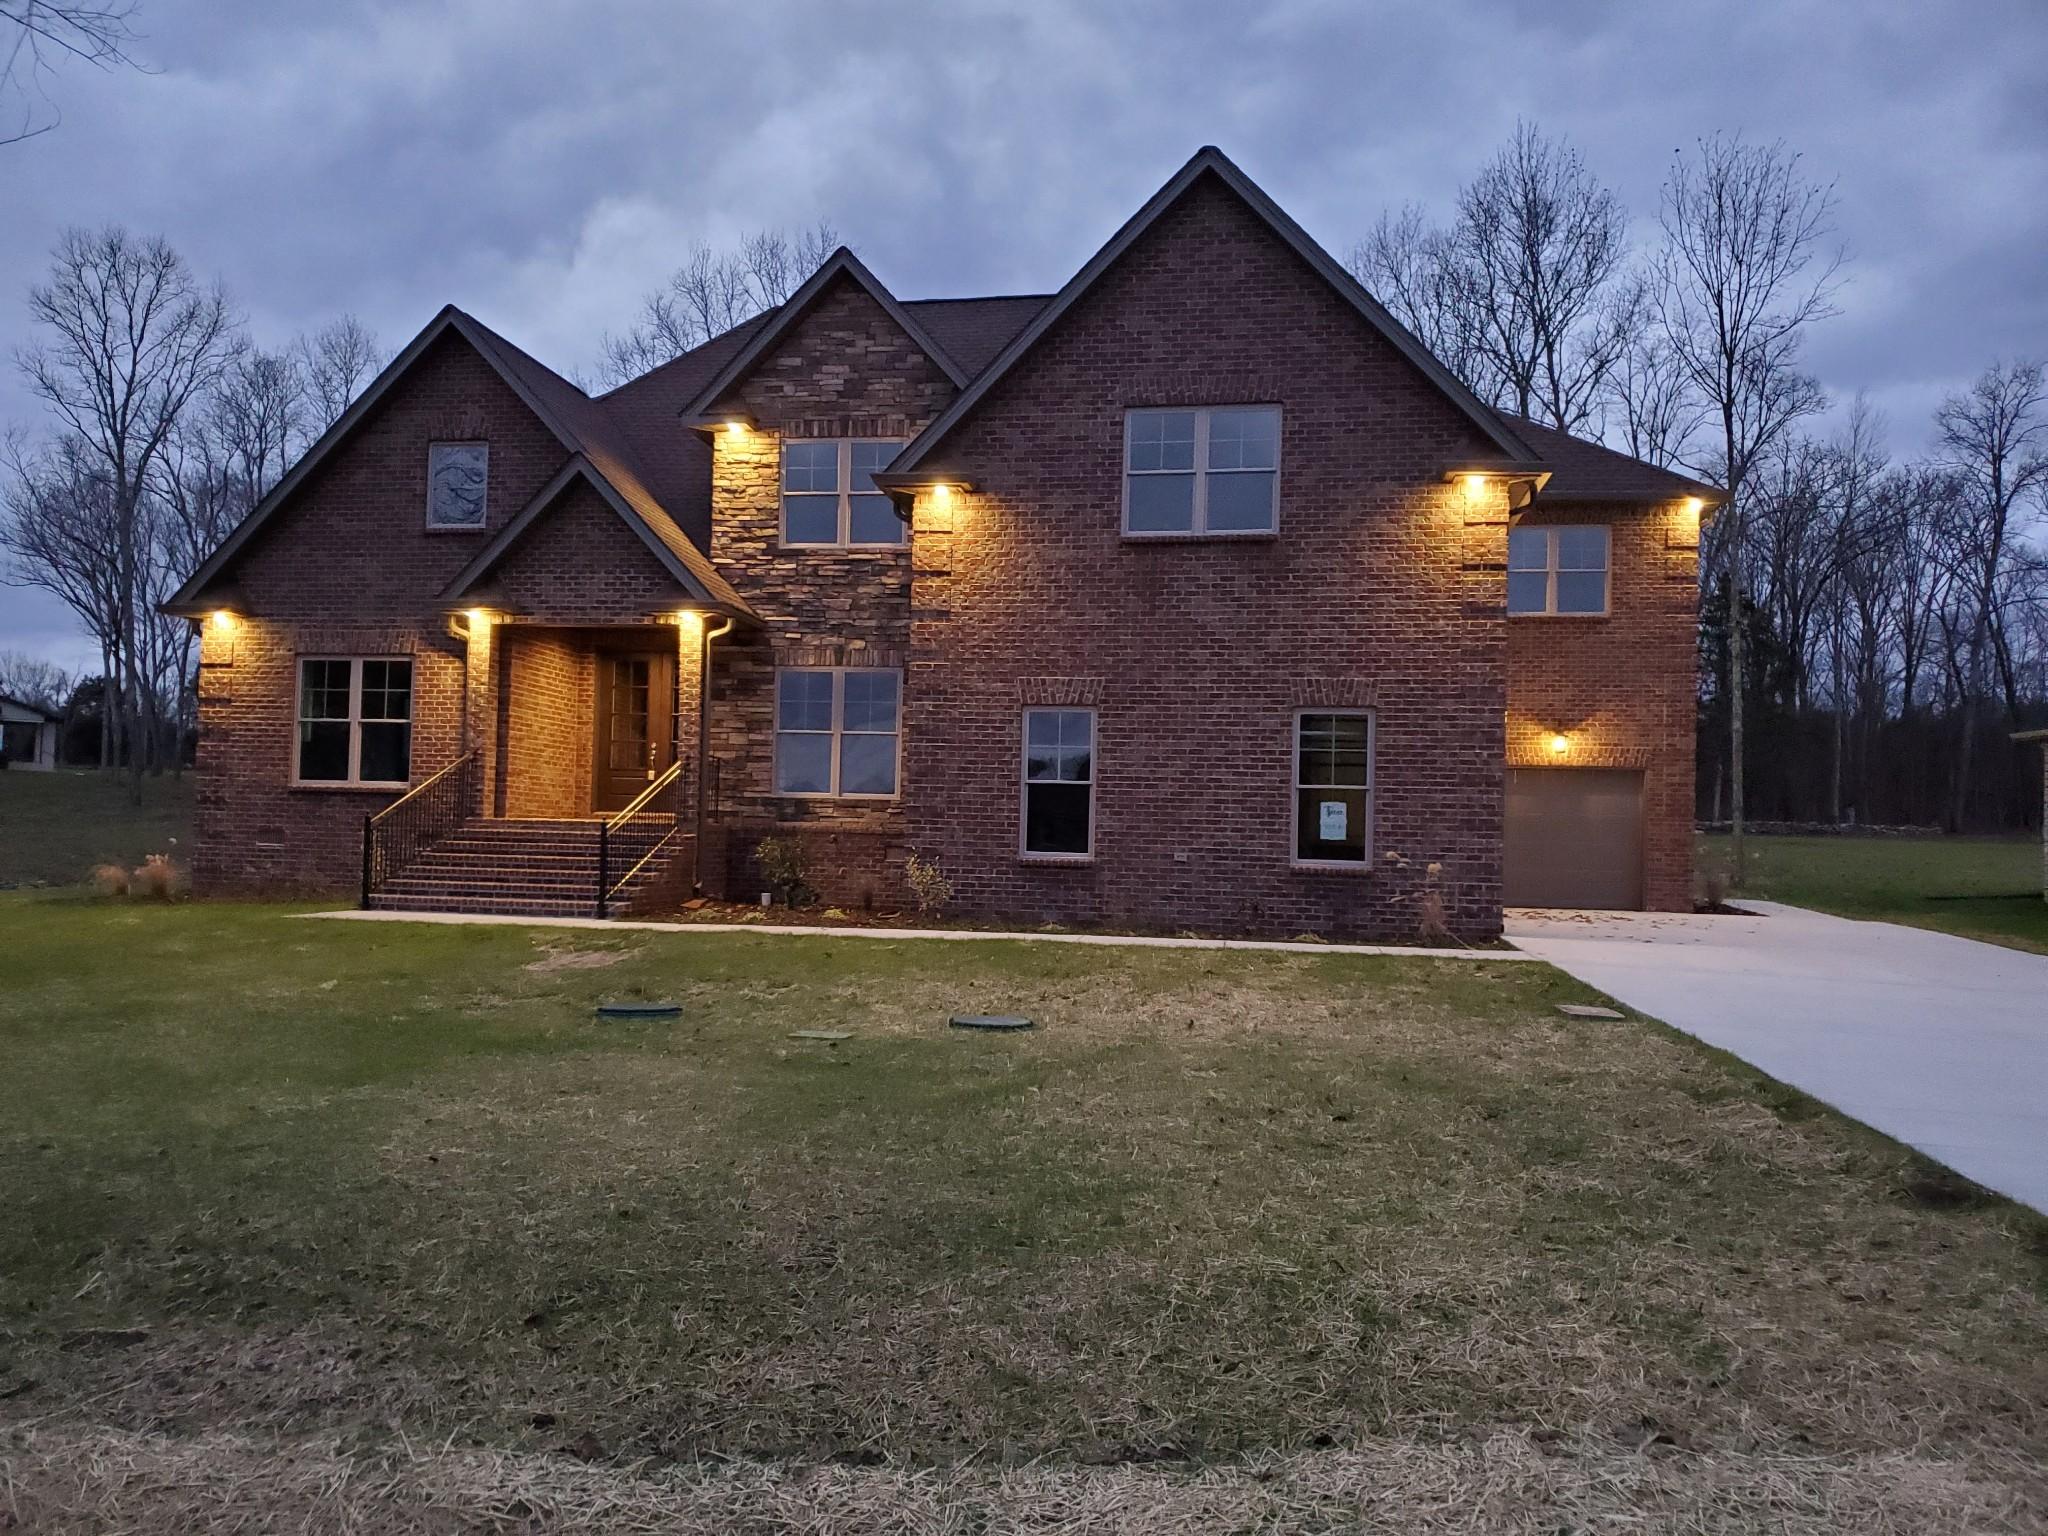 3518 Courtney Ln (Lot 8), Murfreesboro, TN 37129 - Murfreesboro, TN real estate listing